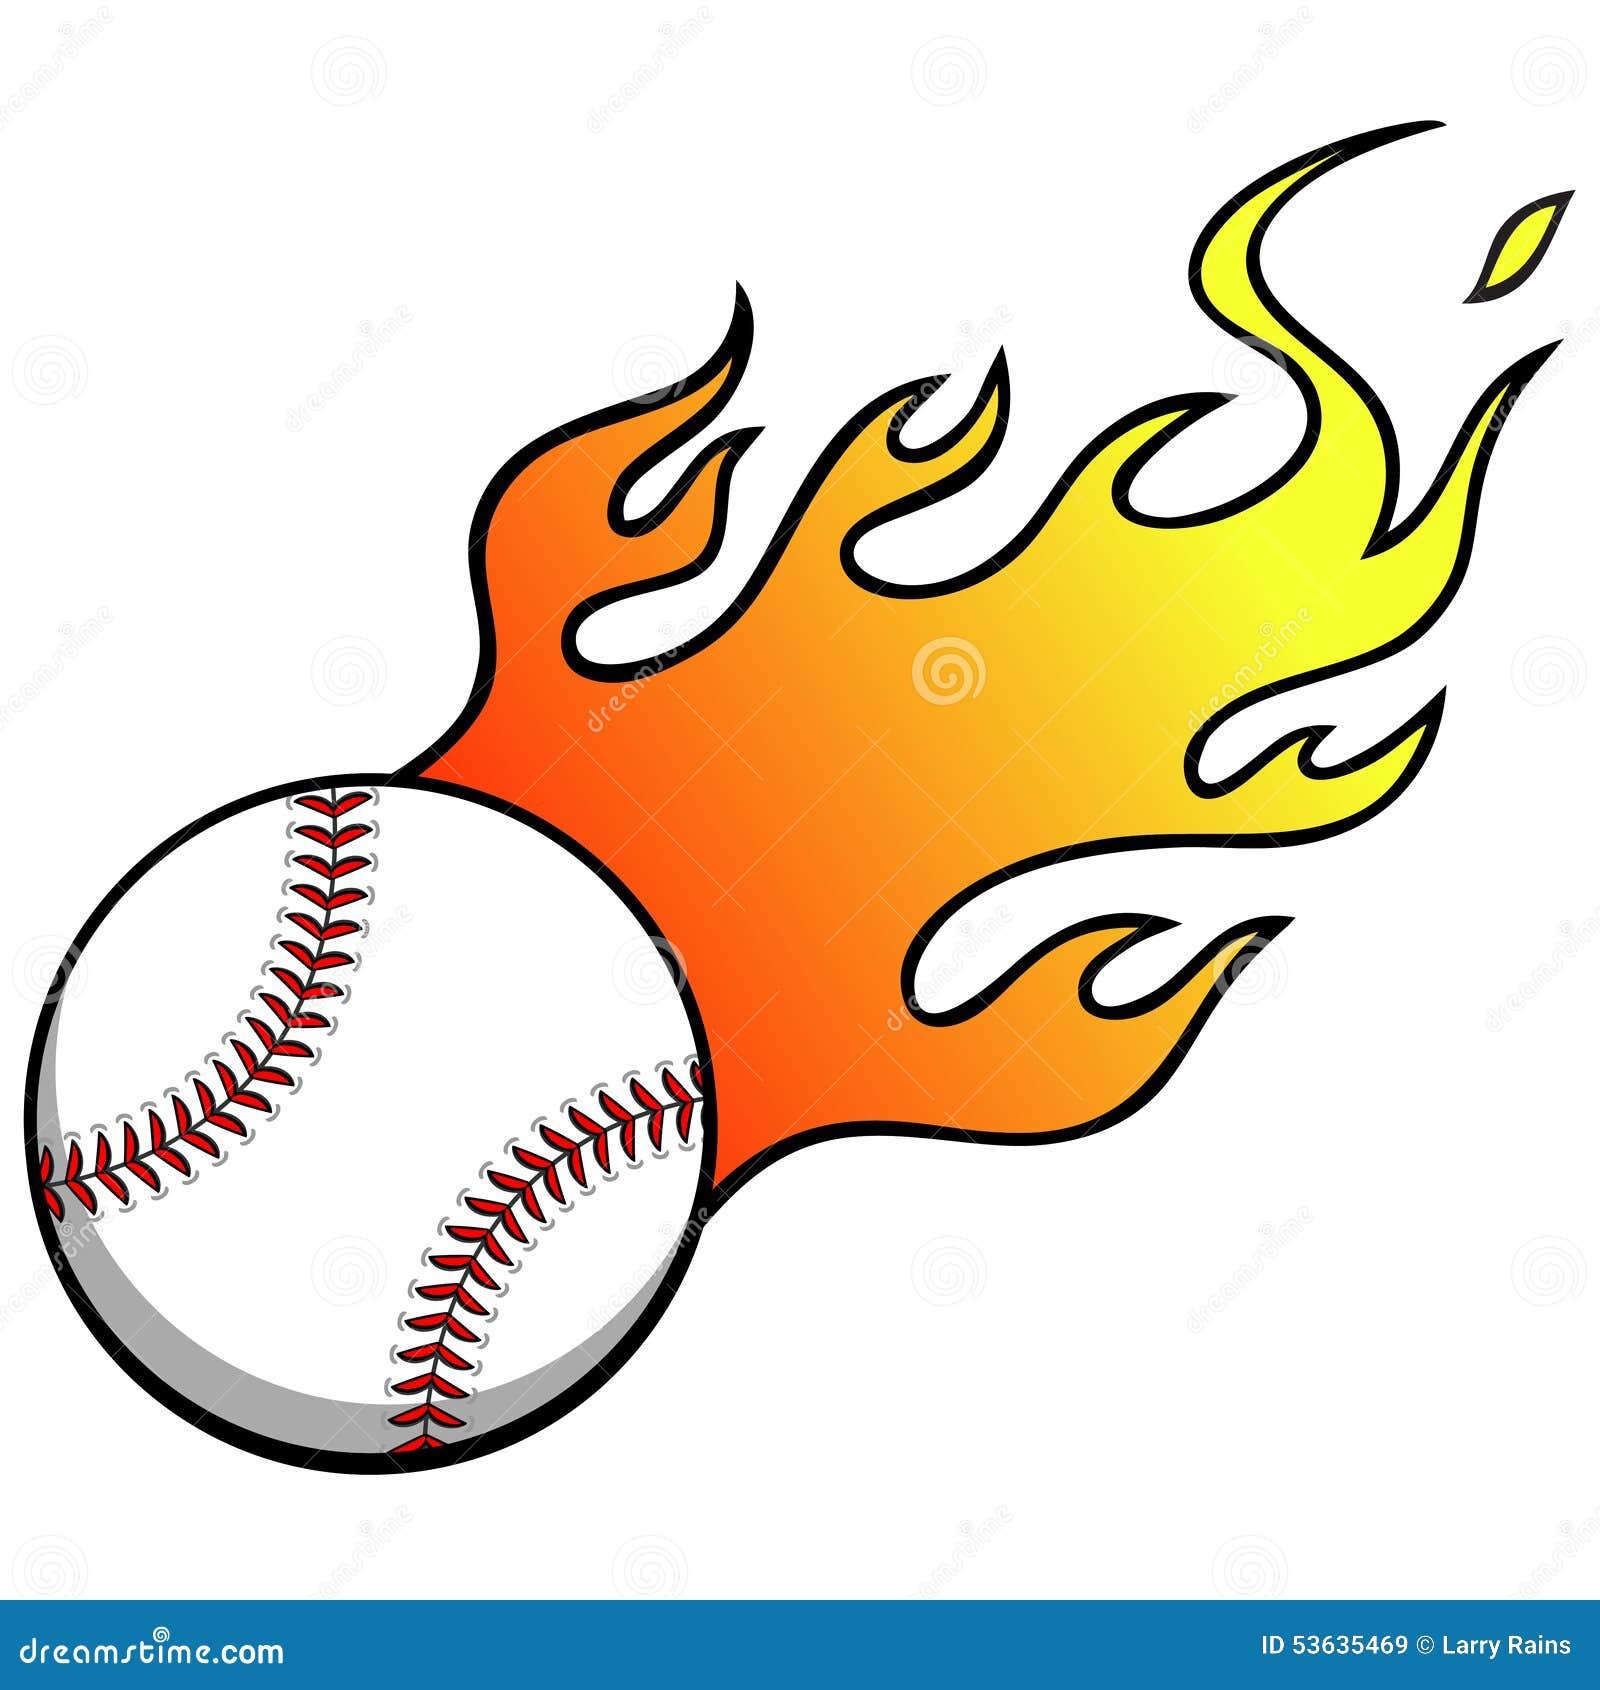 flaming softball clipart Baseball Logos Clip Art Baseball Bat Logo